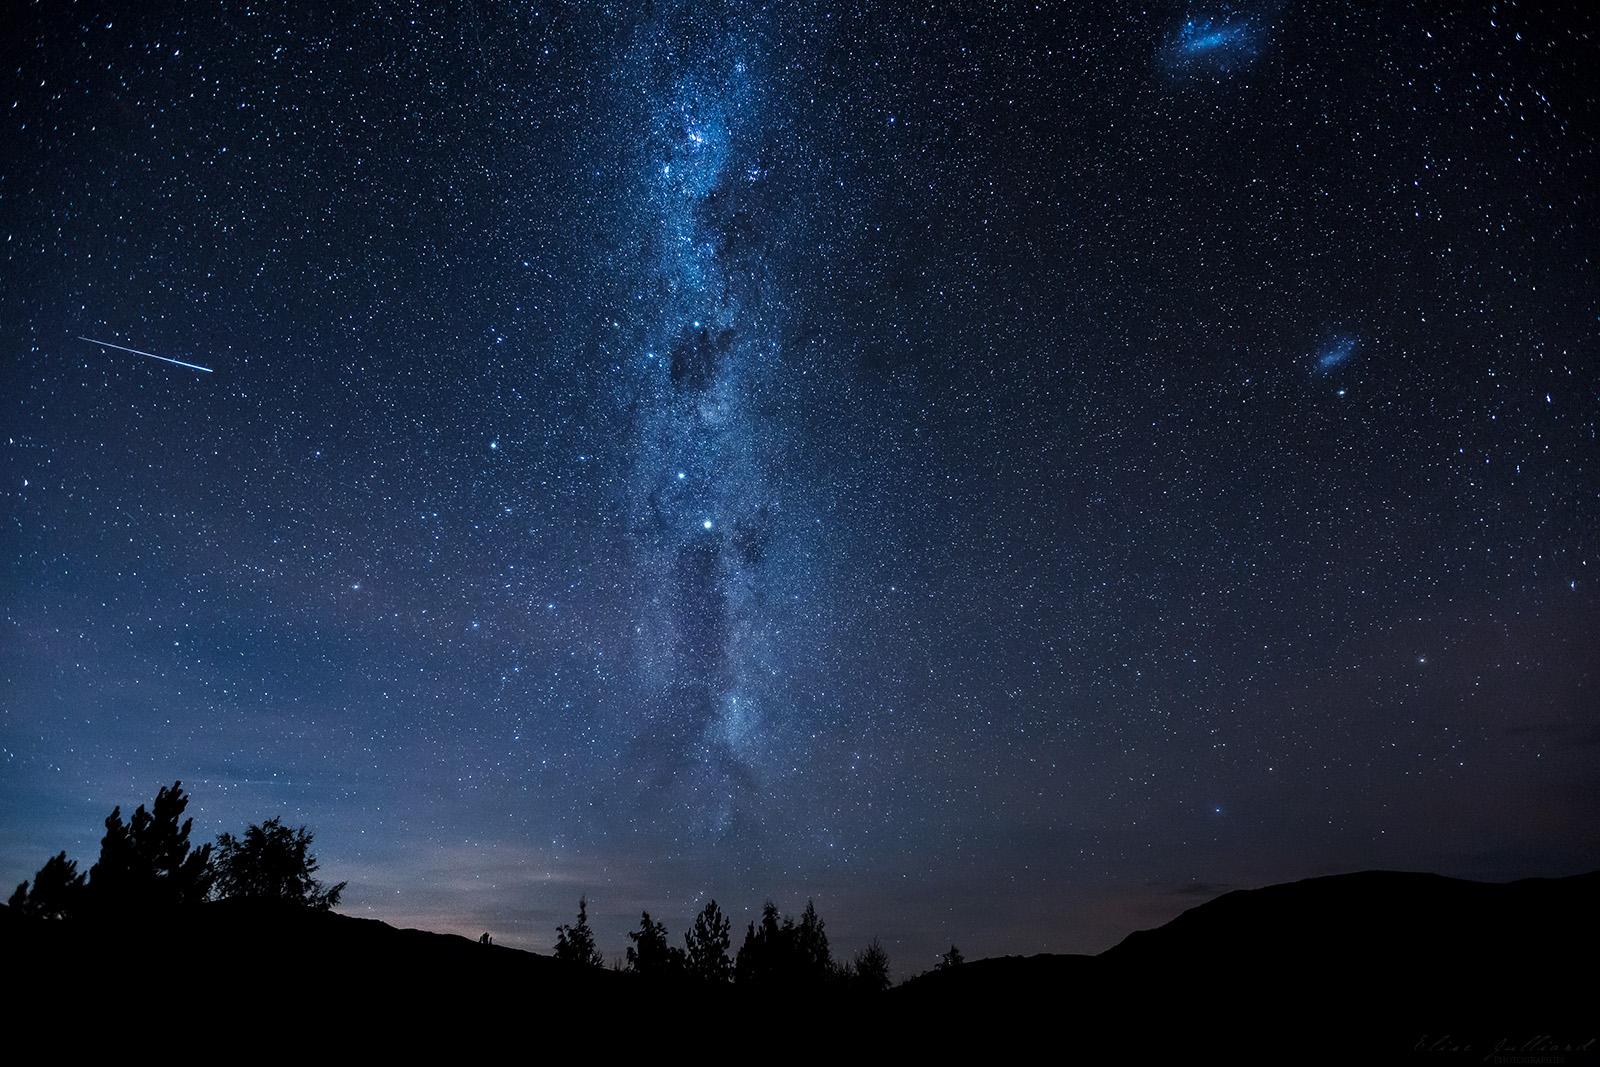 lake-tekapo-new-zealand-nouvelle-zelande-mackenzie-canterbury-south-island-southern-alps-dark-sky-reserve-mont-john-montagne-mountain-travel-voyage-stars-night-landscape